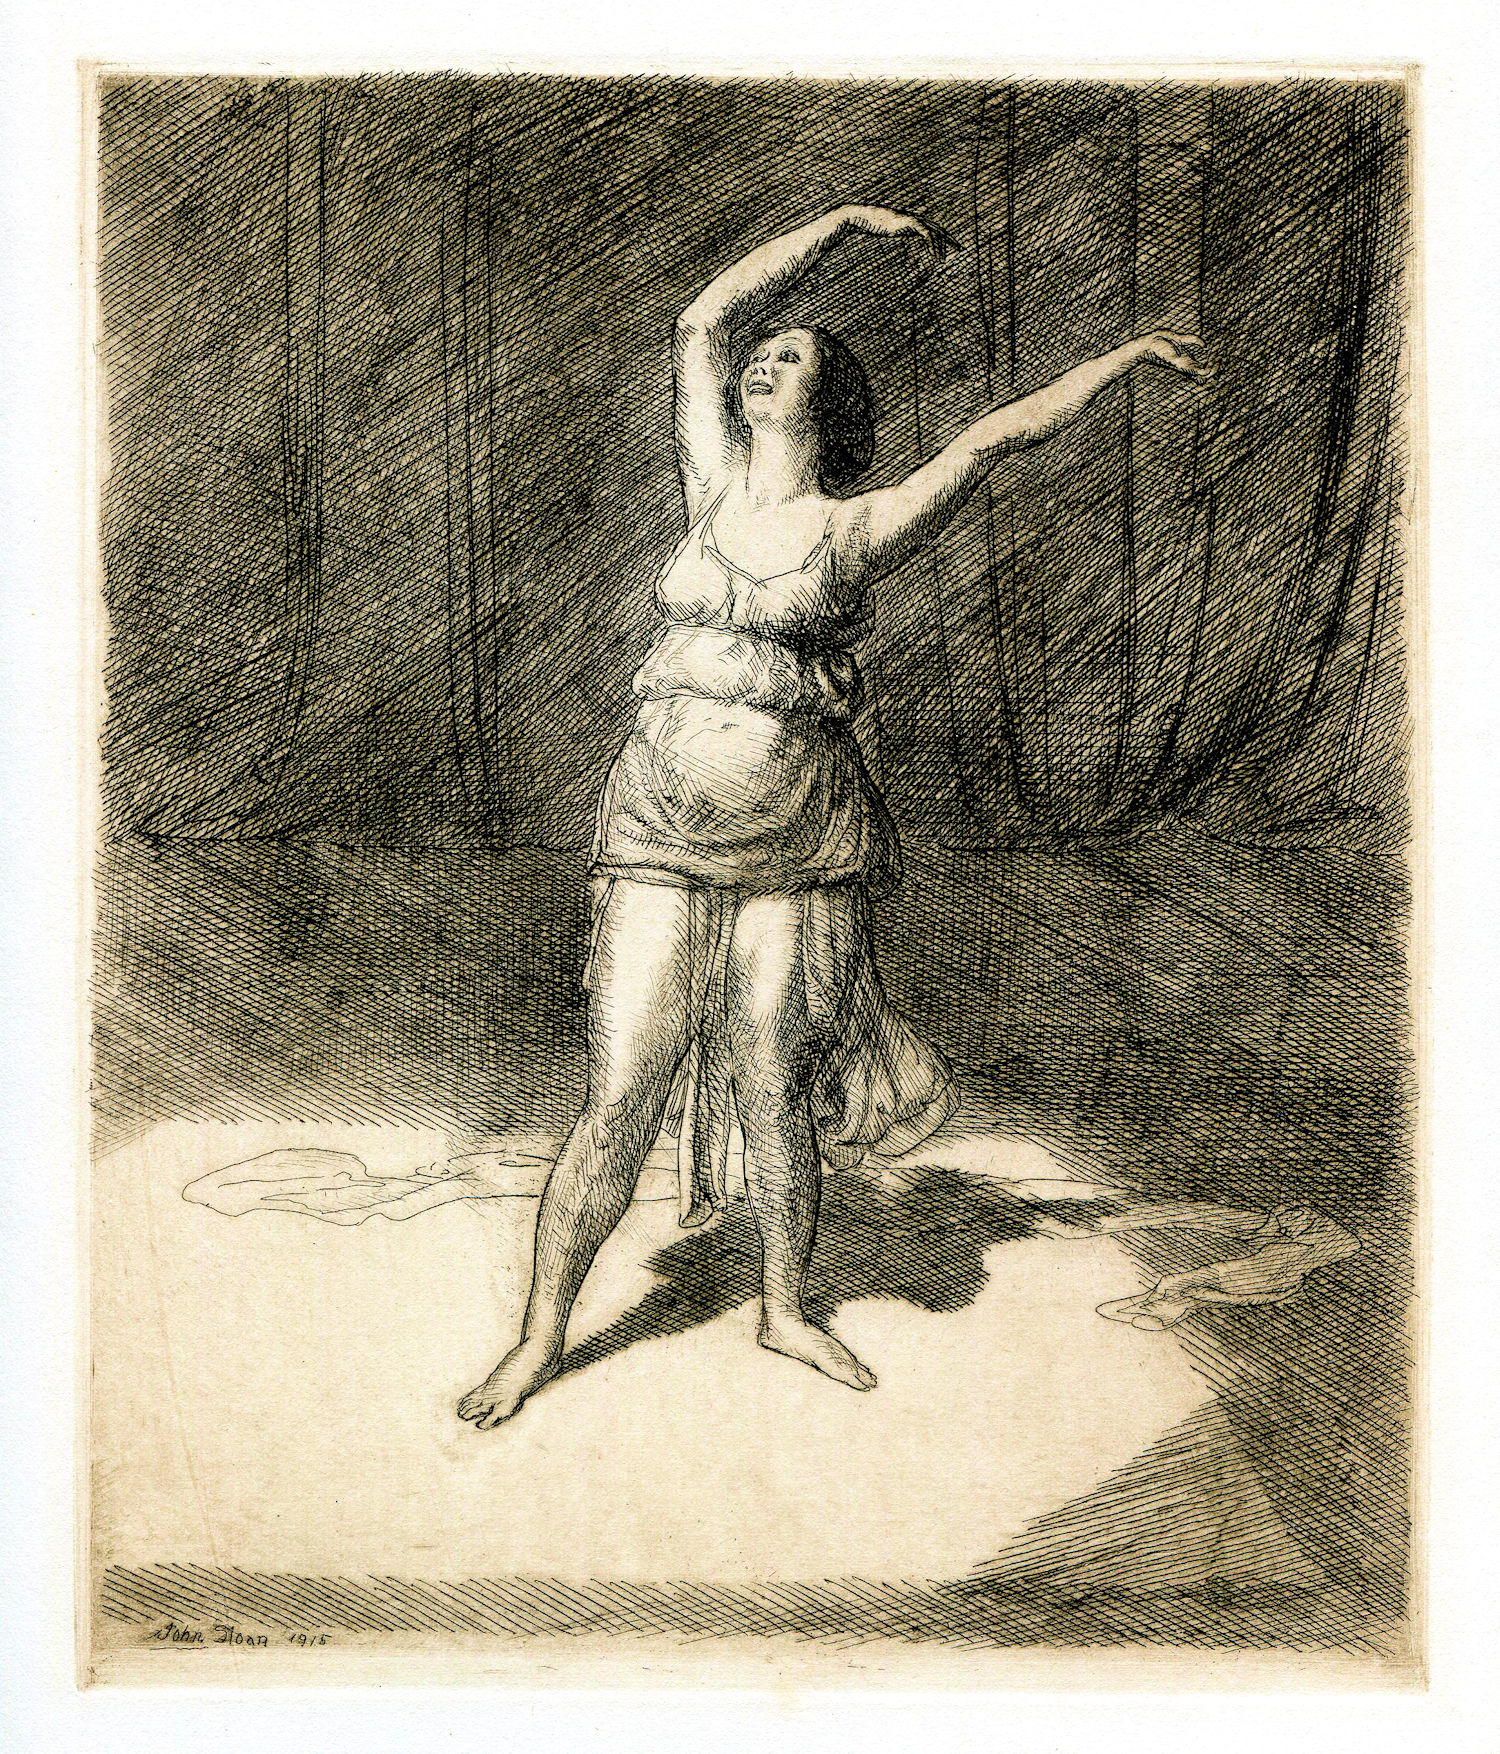 Sloan - Isadora Duncan.jpg